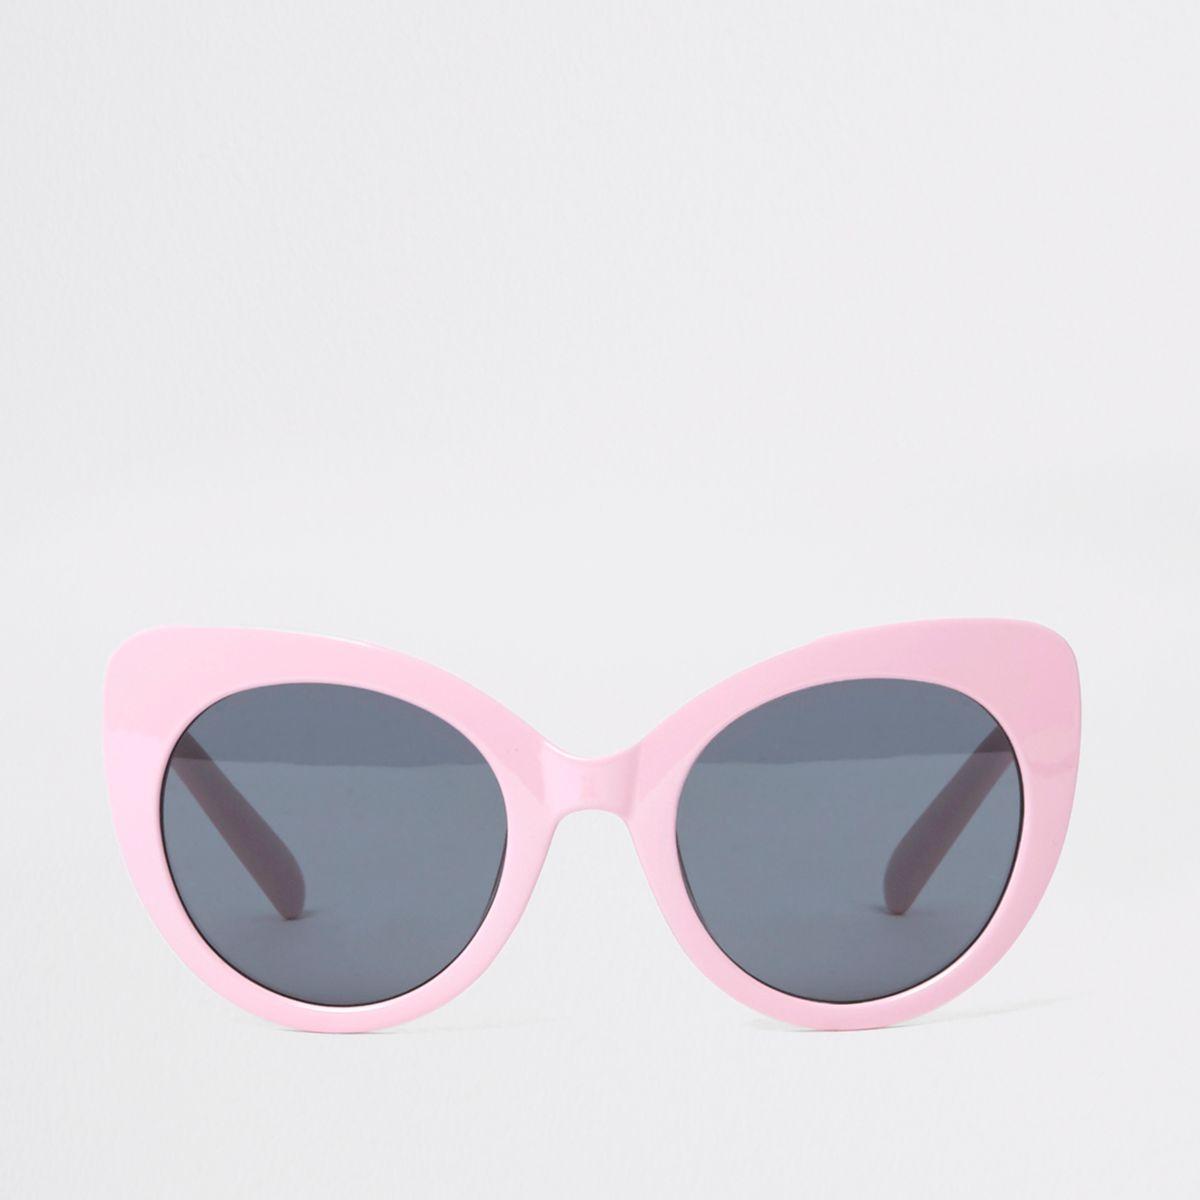 Pink Oversized Plastic Cat Eye Sunglasses by River Island